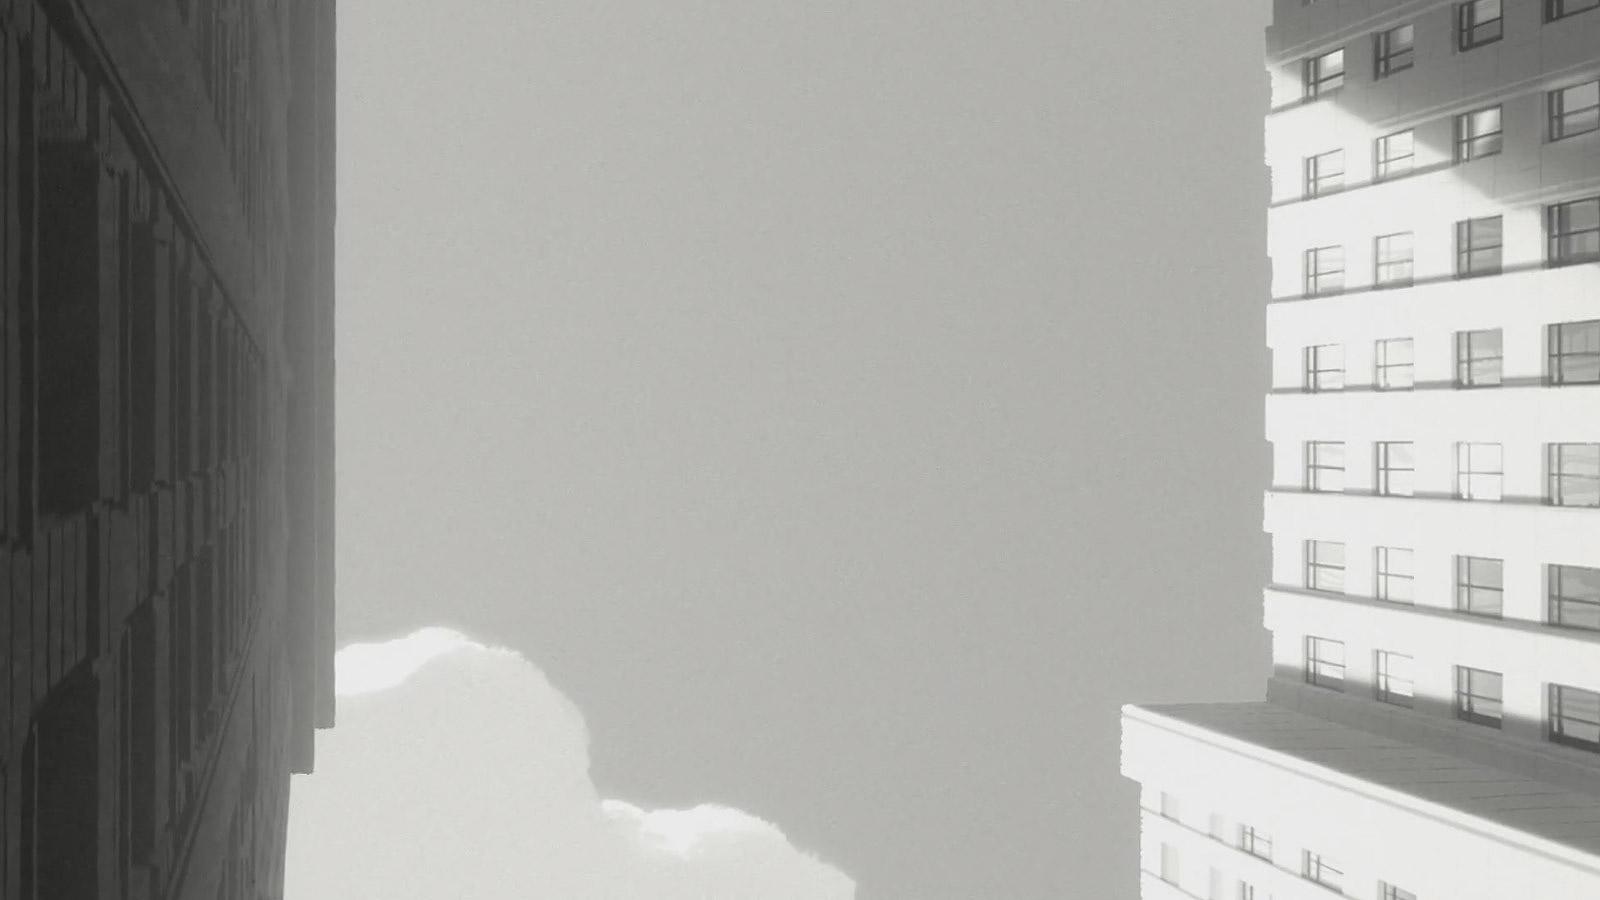 paperman-background-06.jpg